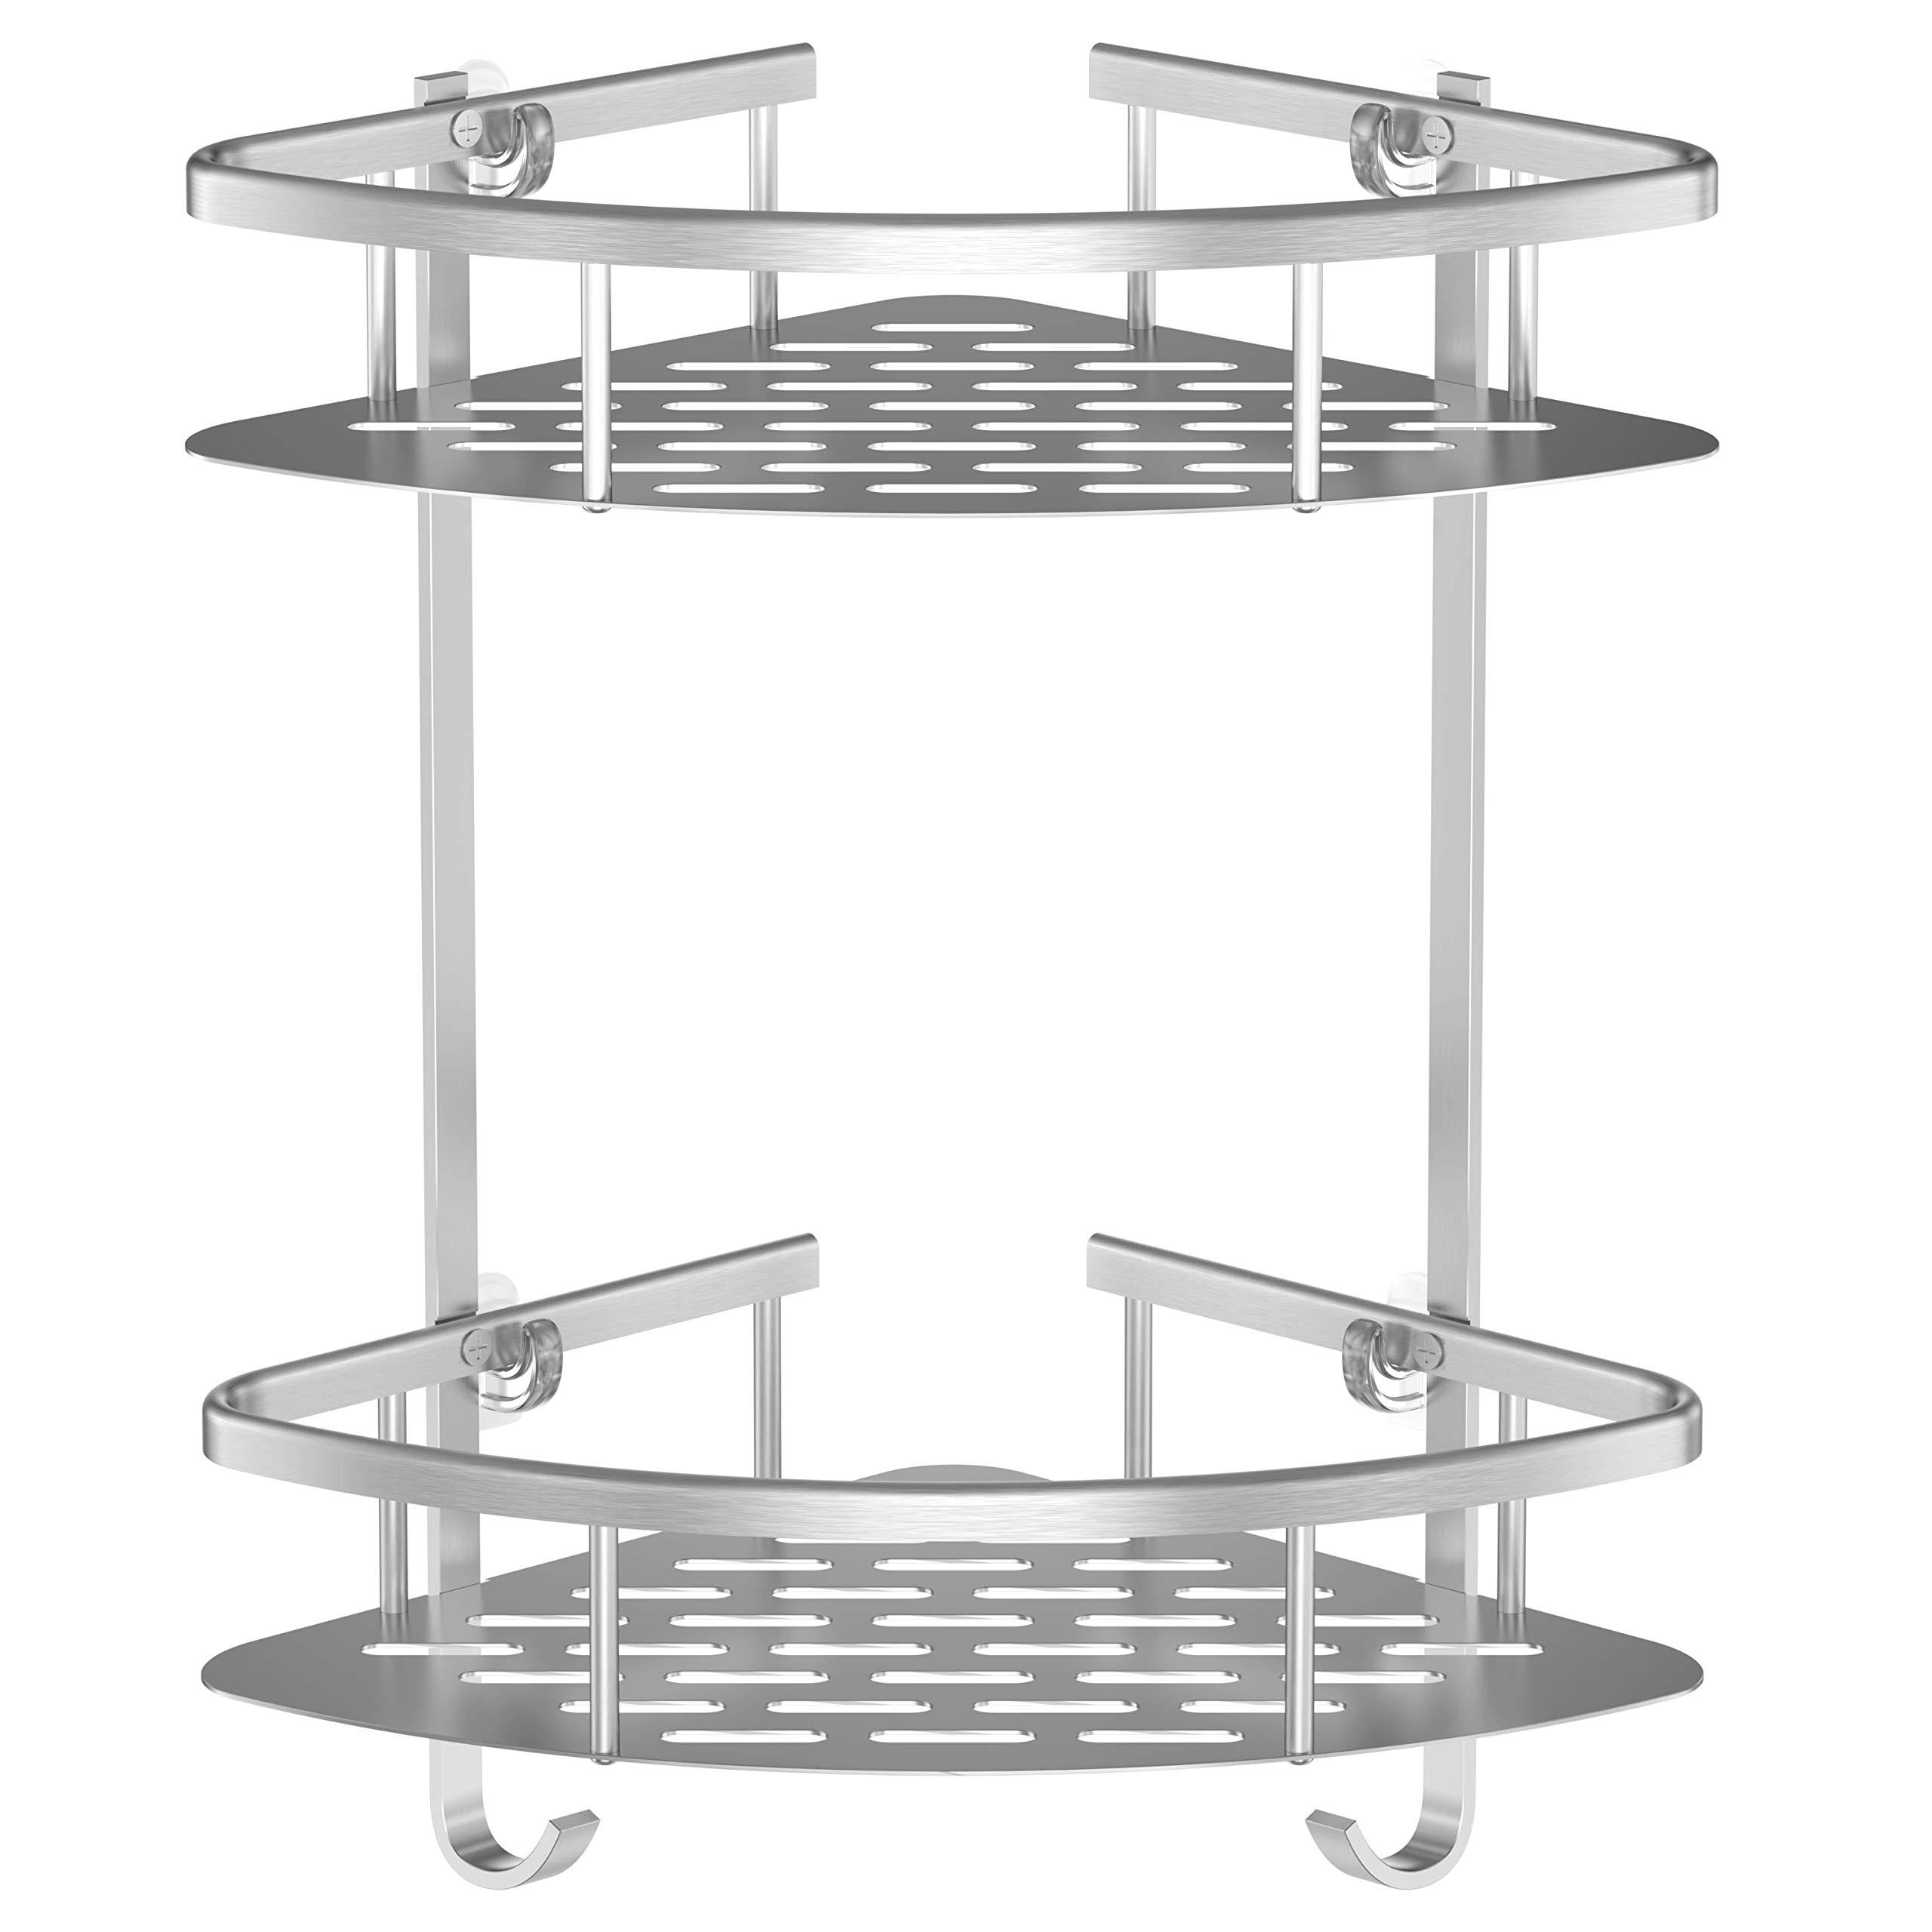 HONEYBULL Shower Shelf [No Drilling] 2 Corner Shelf Shower Caddy - Rustproof Aluminum